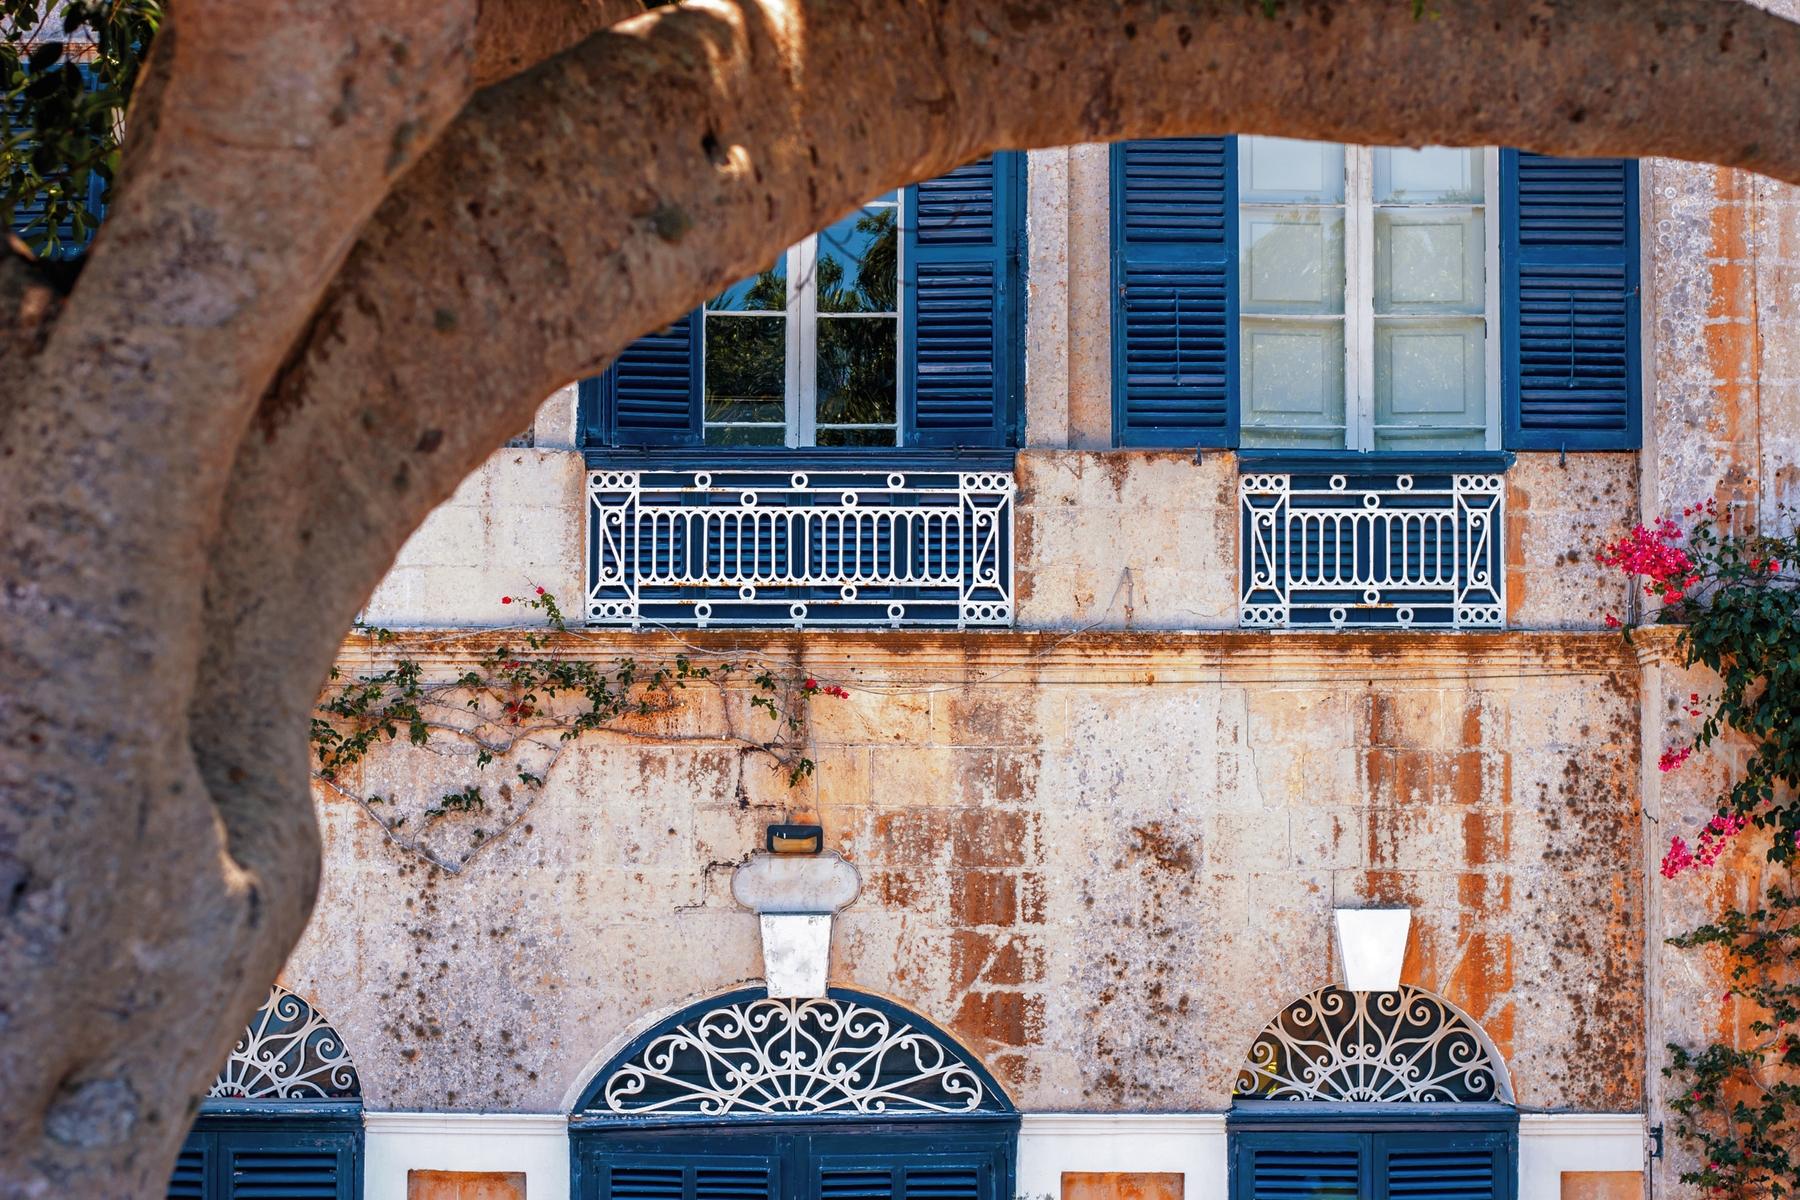 Old city walls in Malta